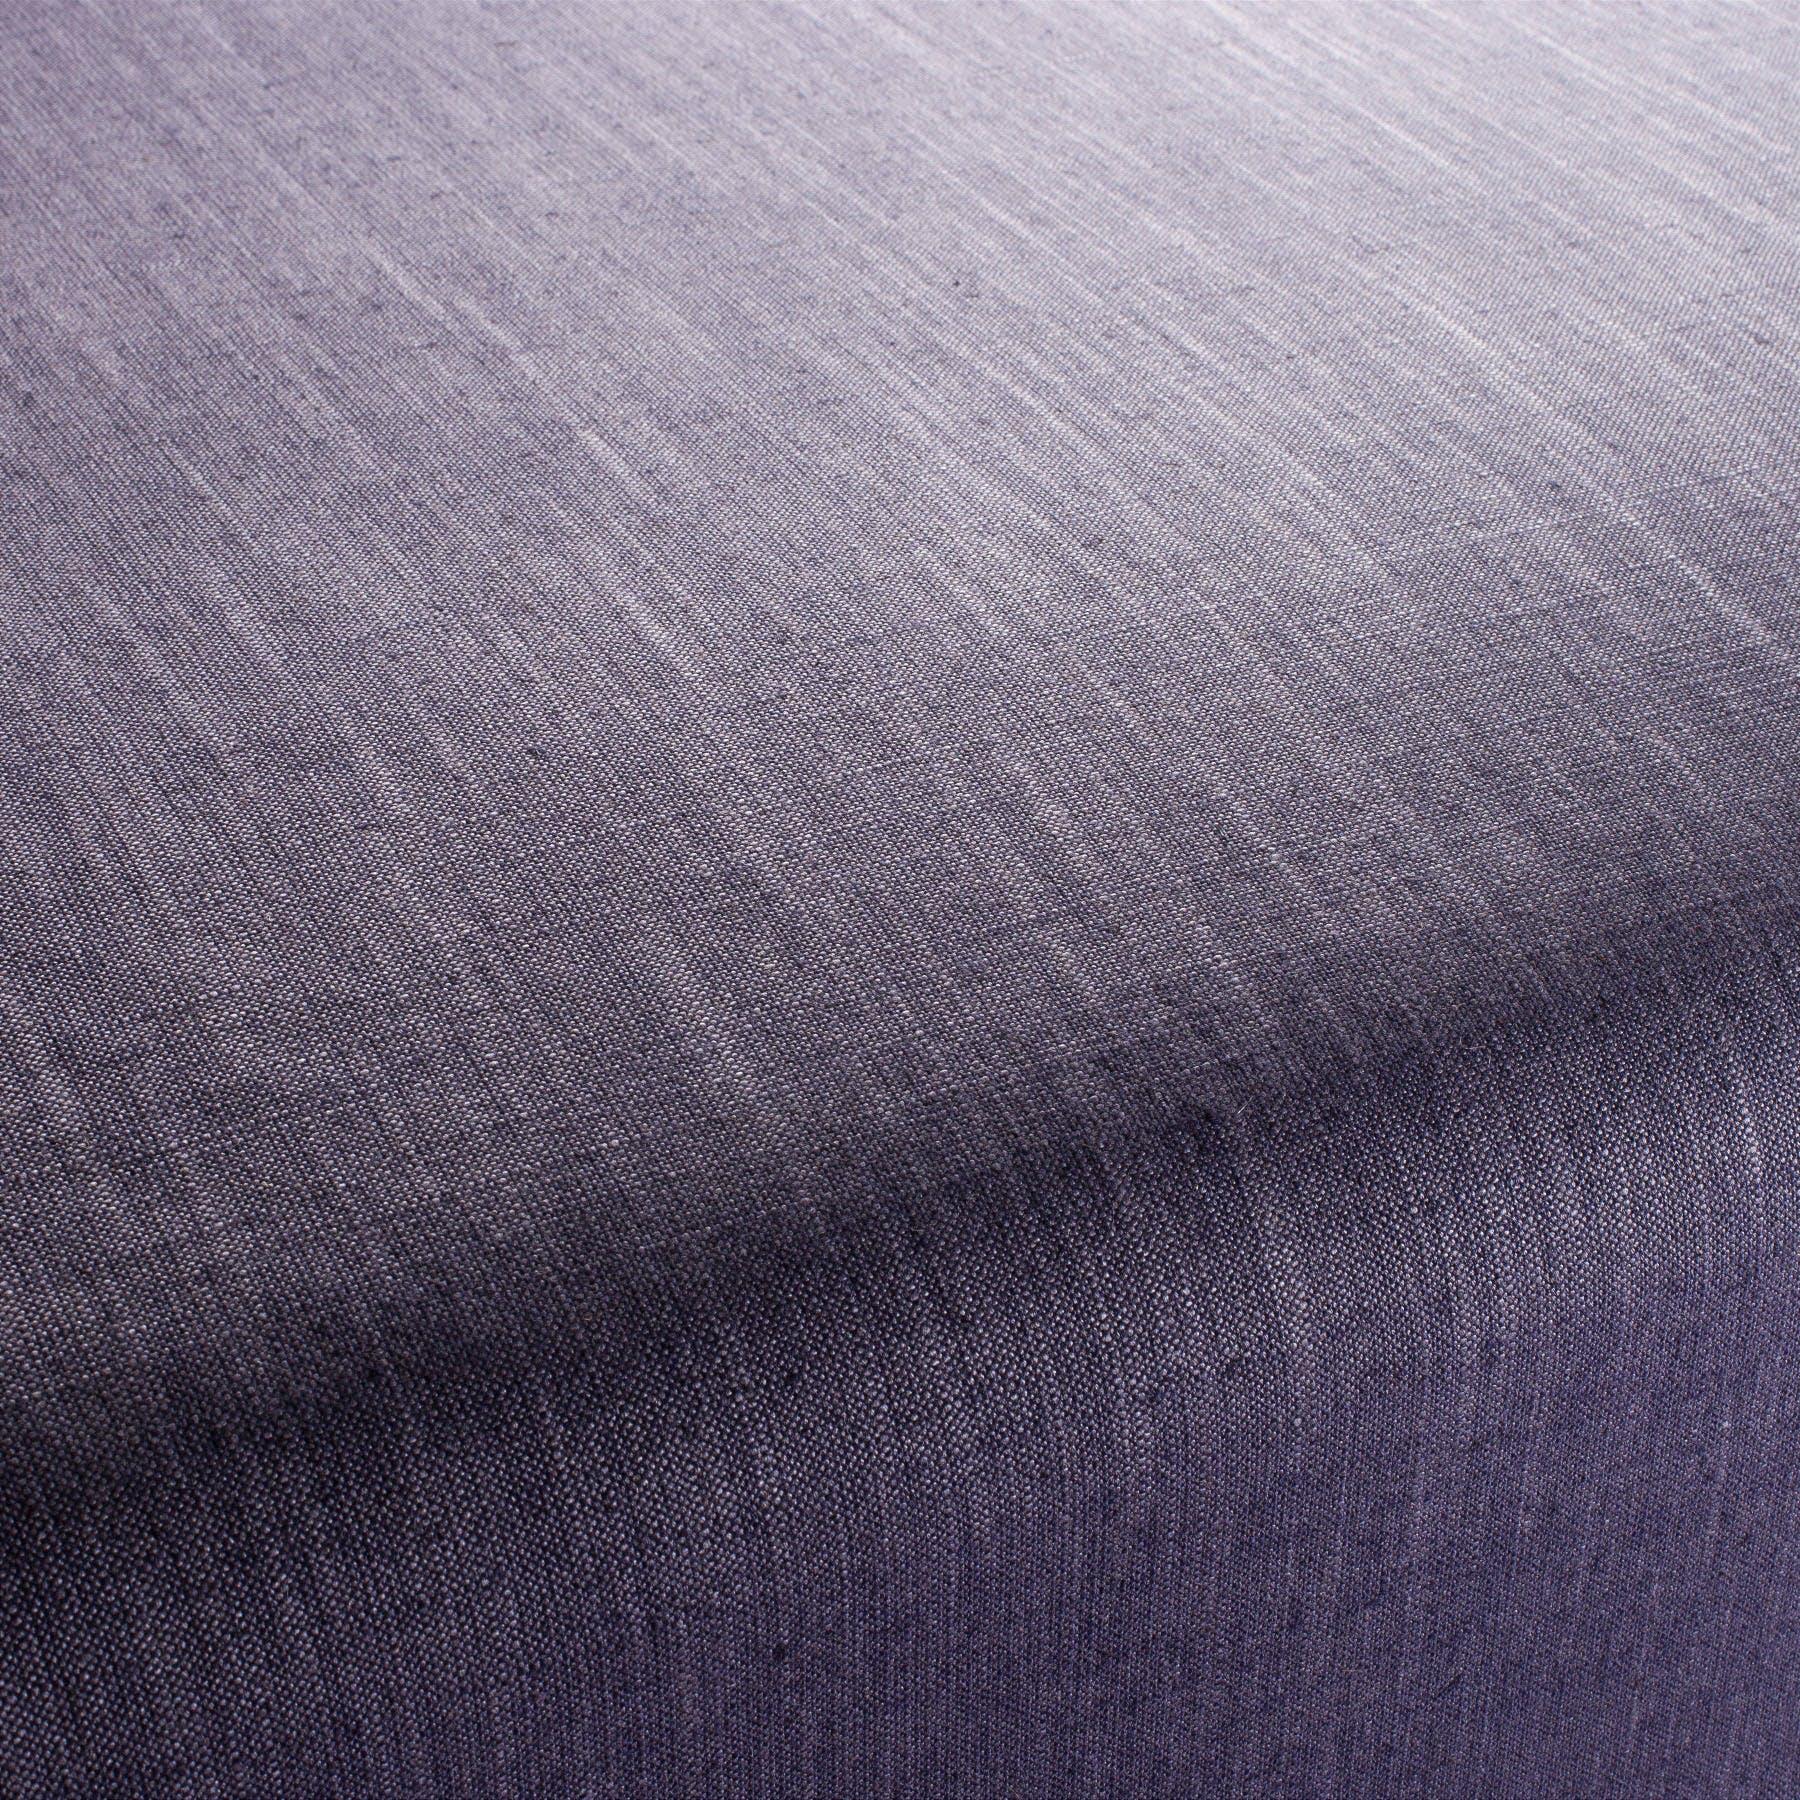 Jab-anstoetz-fabrics-purple-two-tone-vol-2-upholstery-haute-living